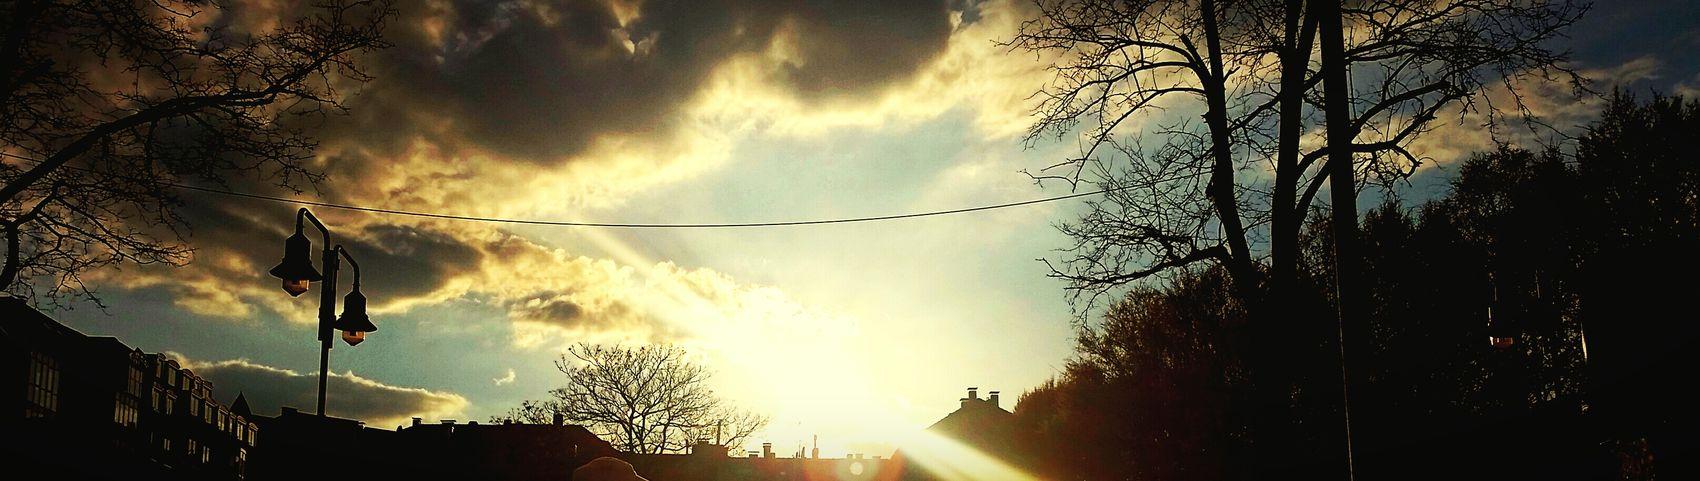 Sunny Goldenhour